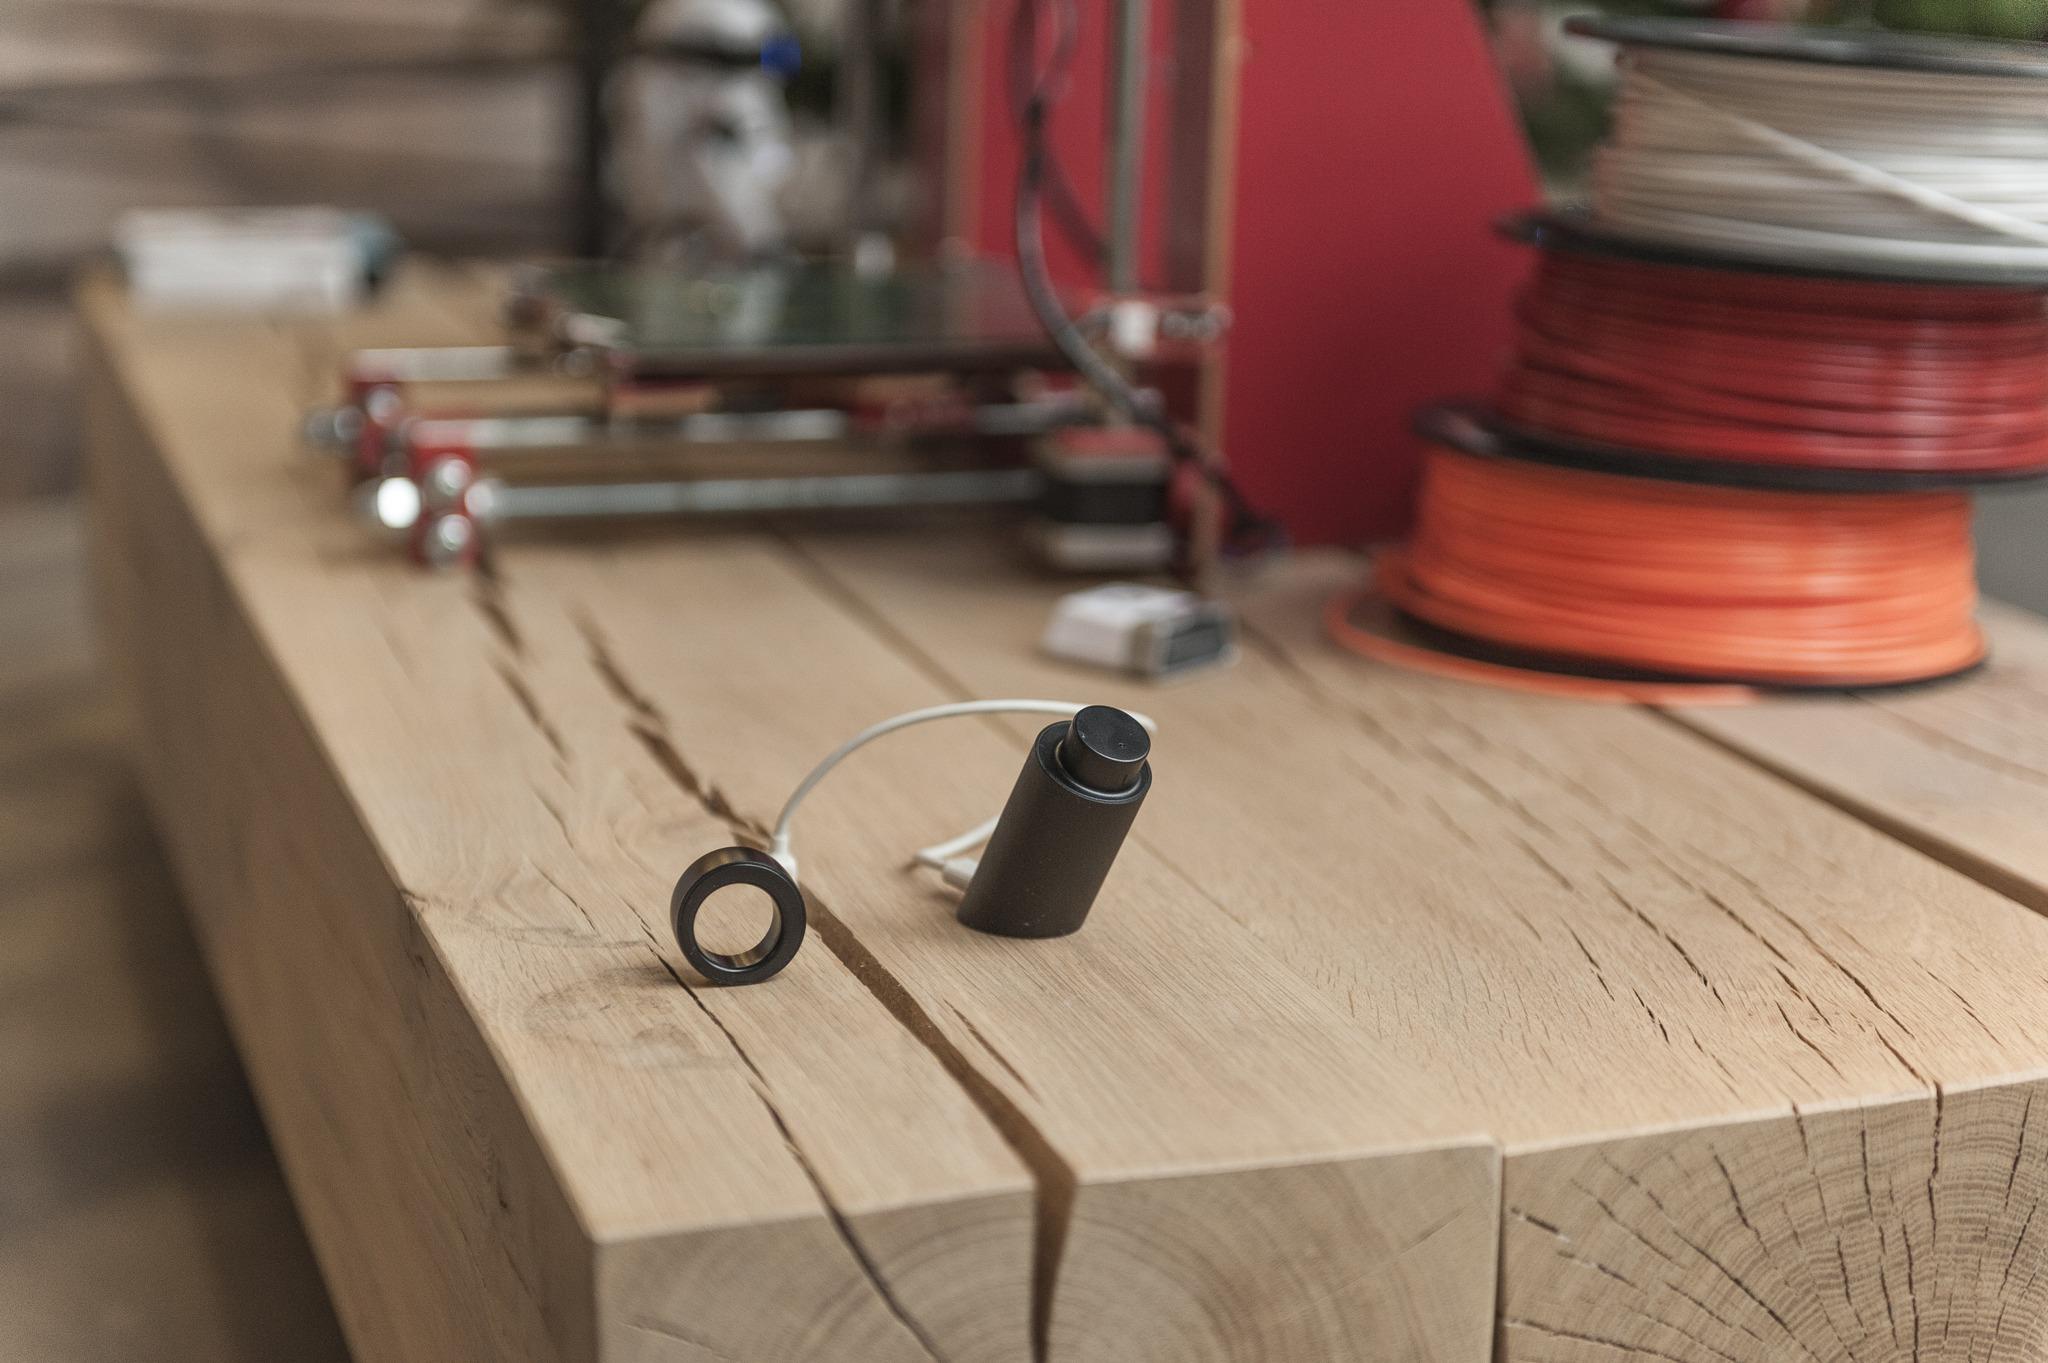 DDB showcases innovative ideas with kickstarter platform